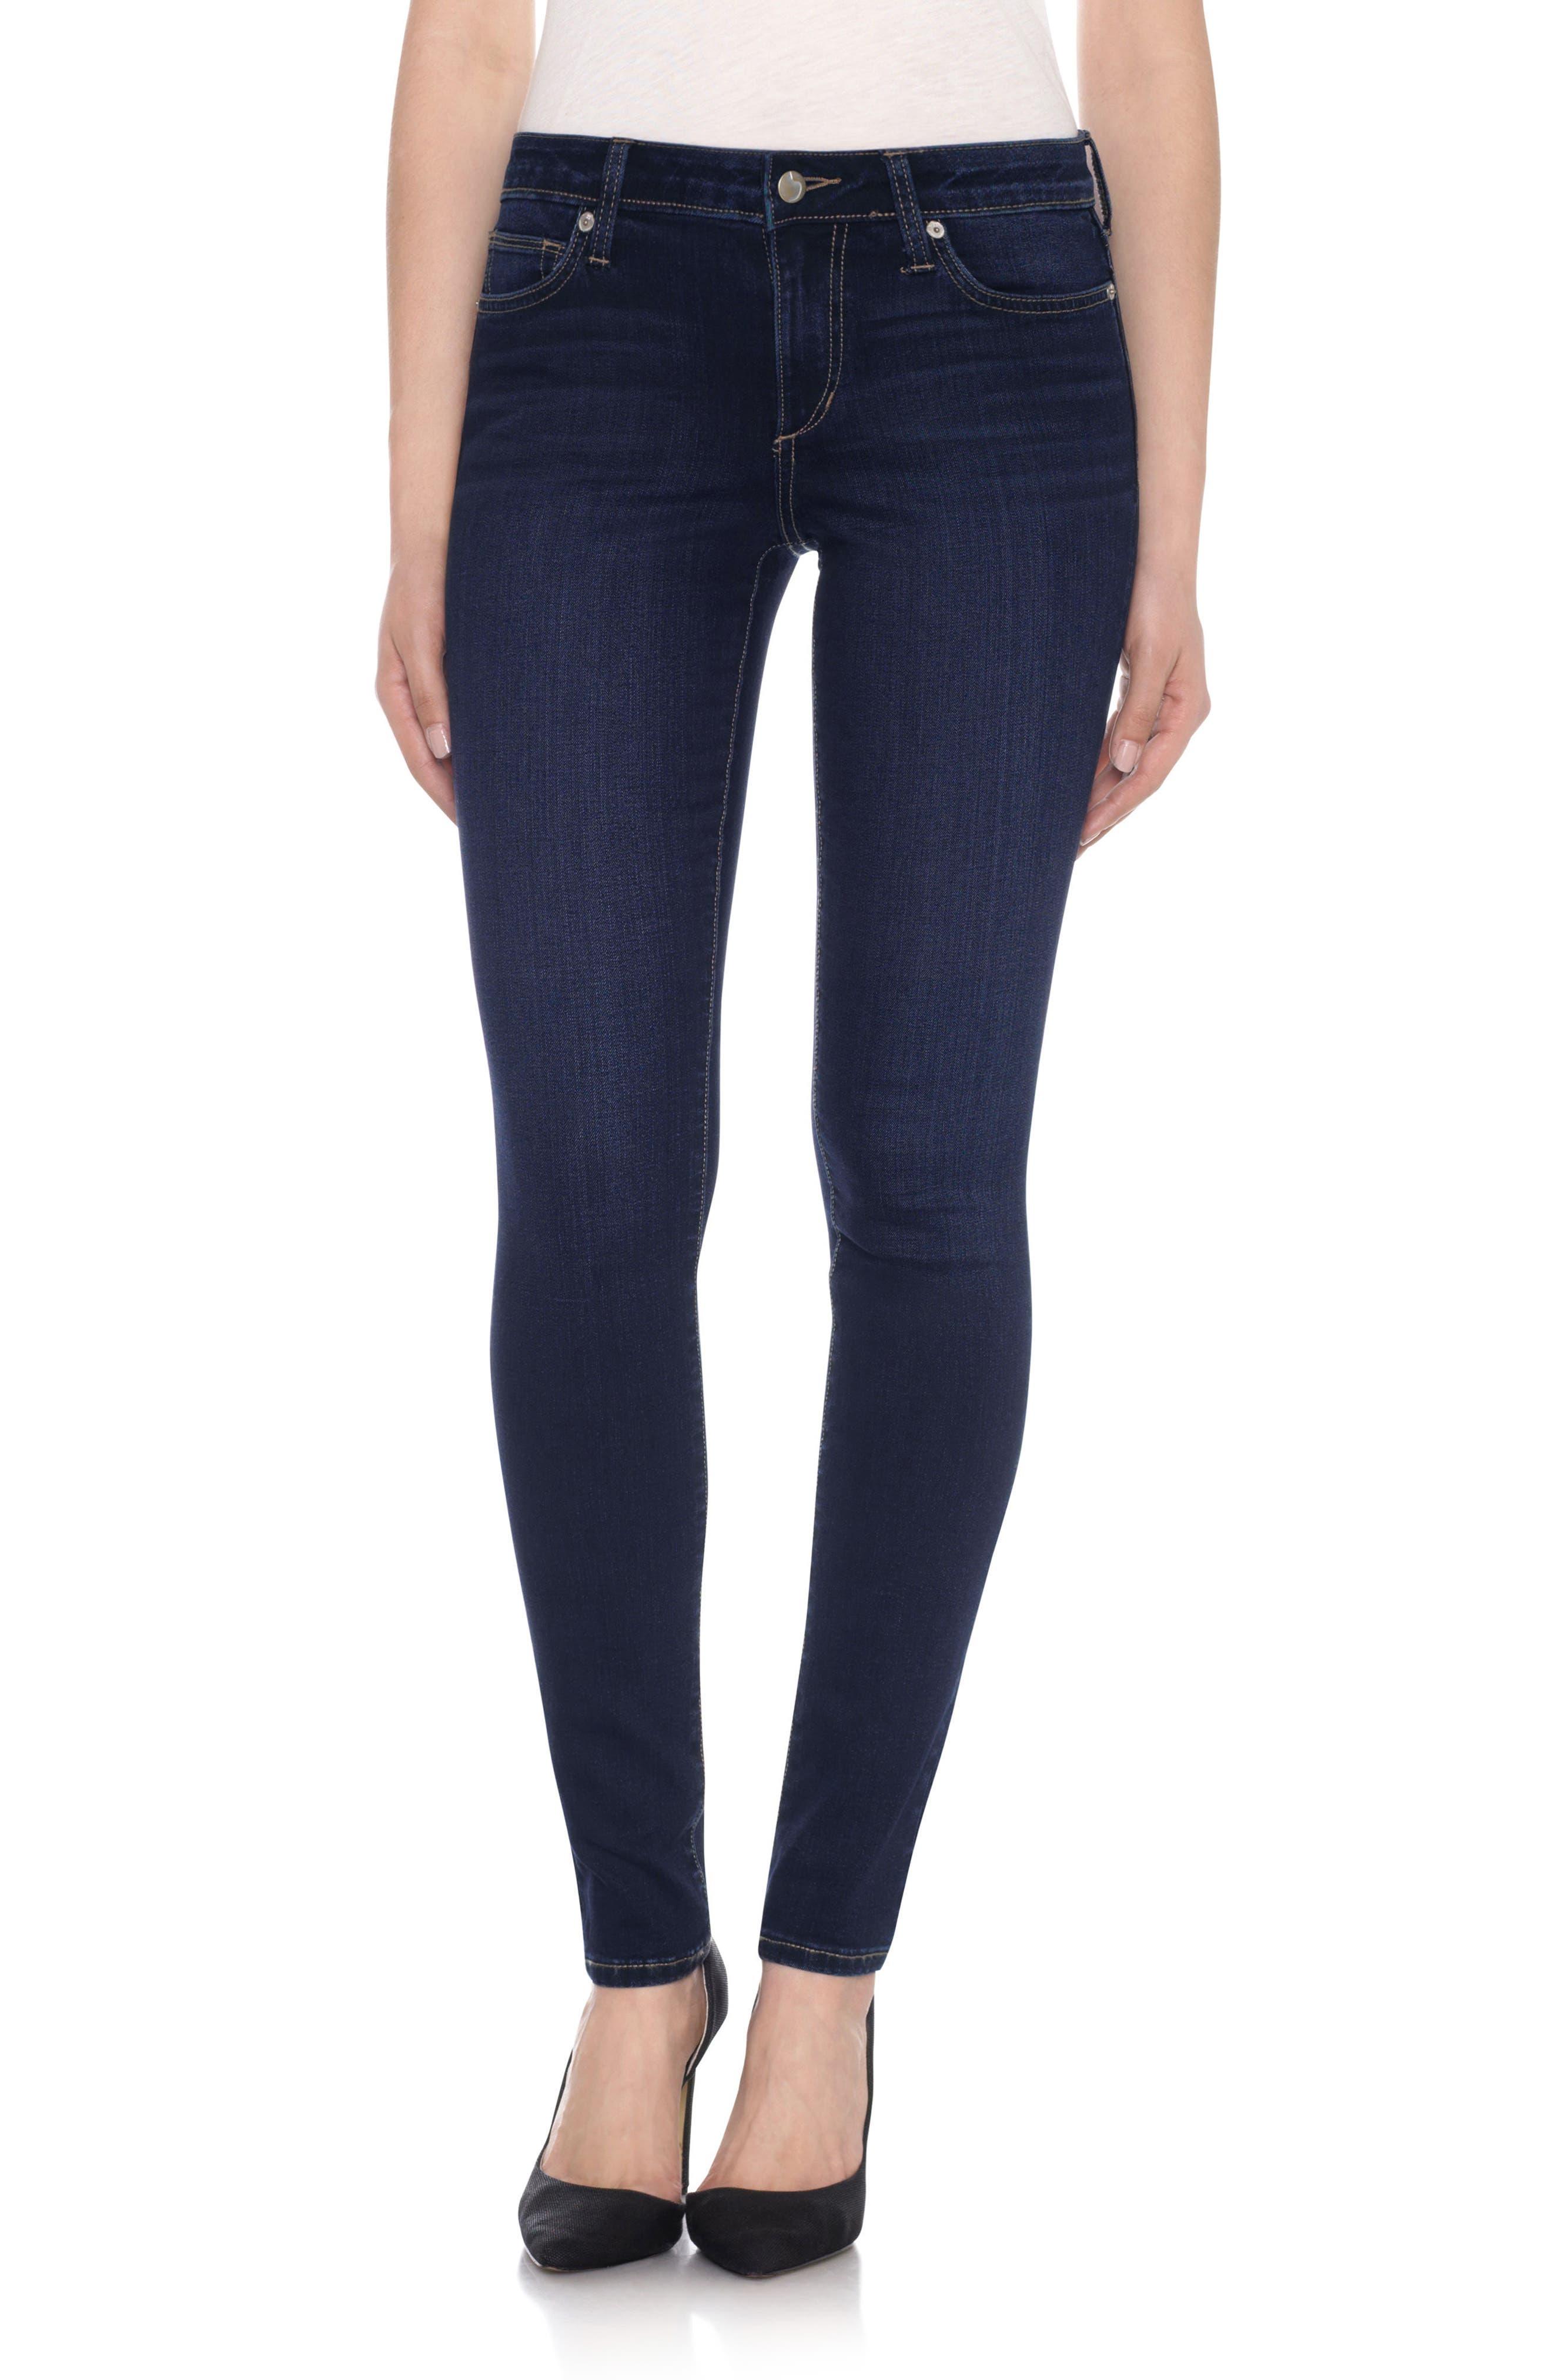 Alternate Image 1 Selected - Joe's Honey Curvy Skinny Jeans (Suzen)